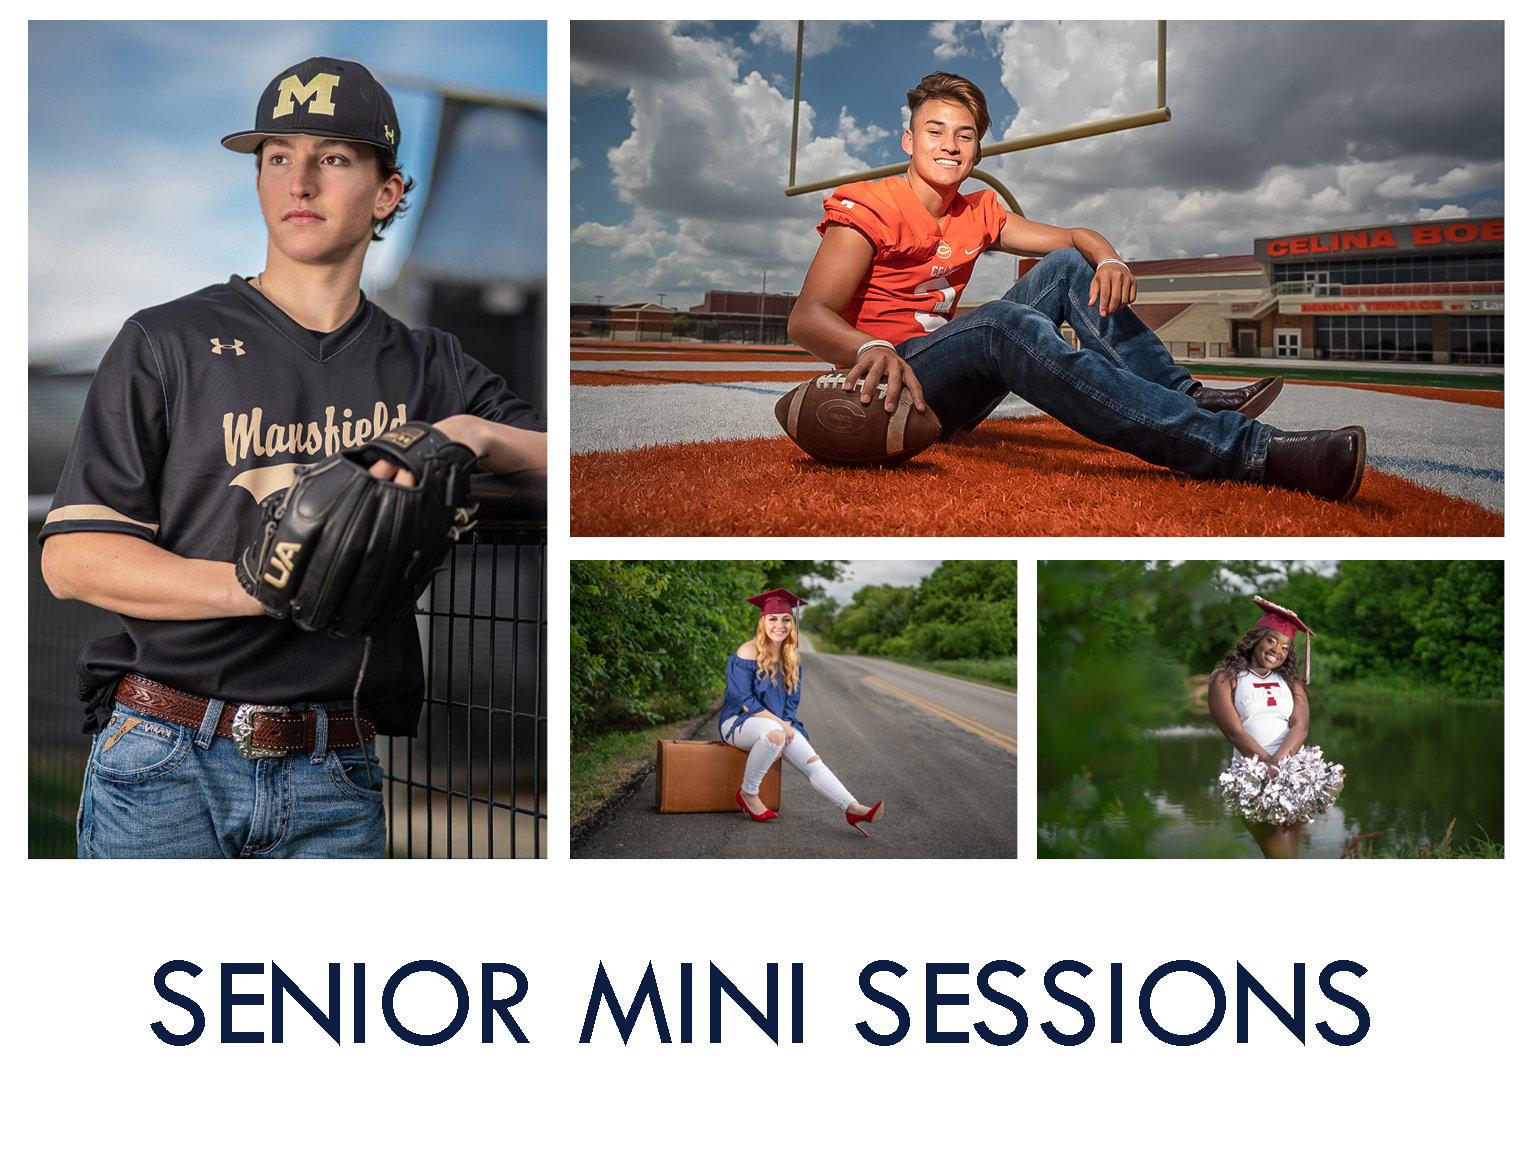 Senior Mini Session